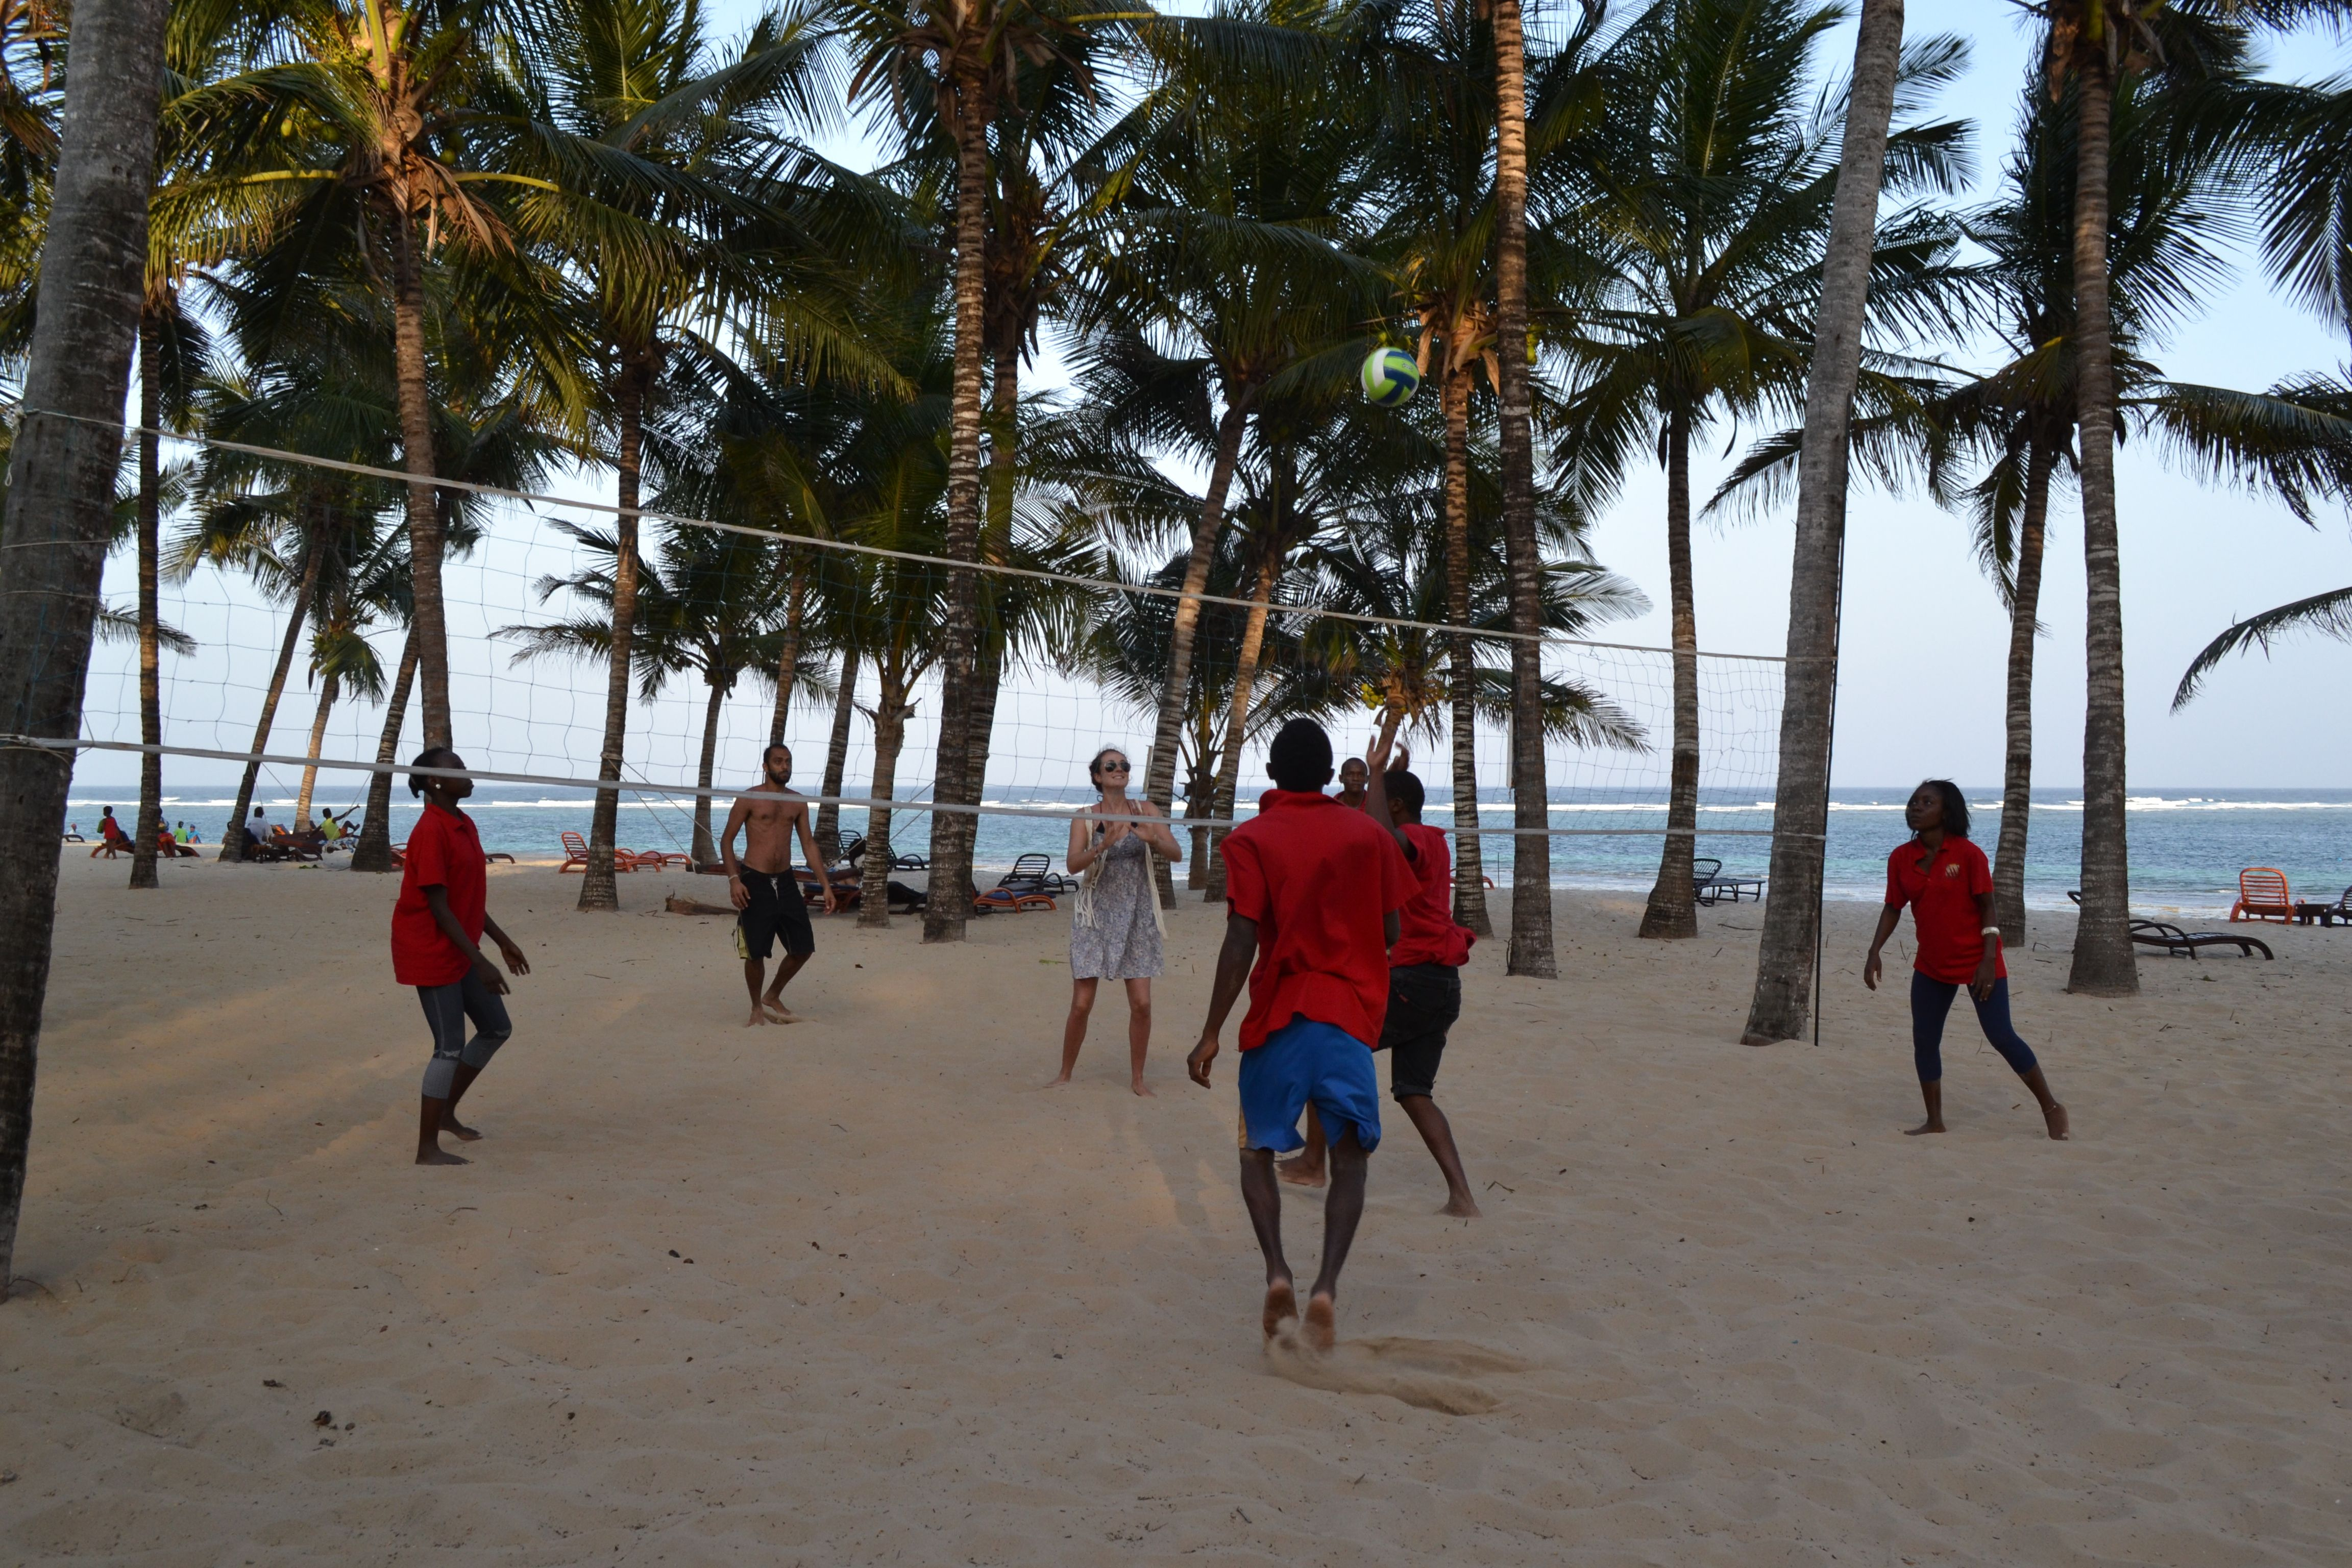 Playing Beach Volleyball At Tiwi Beach Www Ota Responsibletravel Com Kenya Beach Resorts Christmas Destinations Surfing